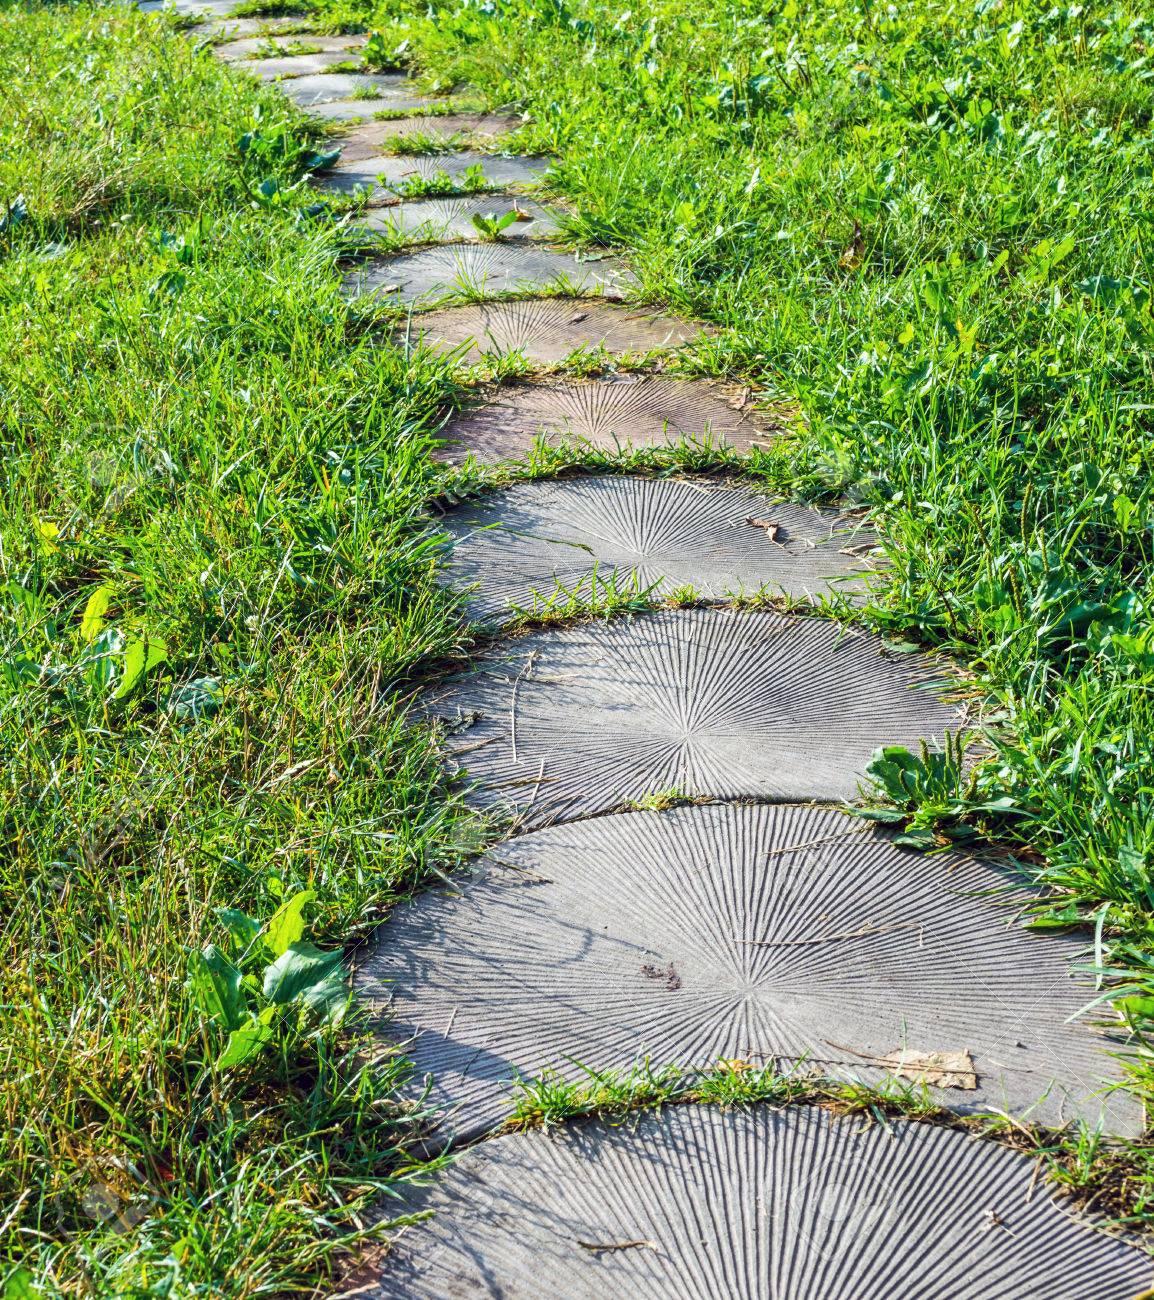 Genial Stepping Stone Walkway Garden Path. Stones Are Like The Tree. Stock Photo    62084837